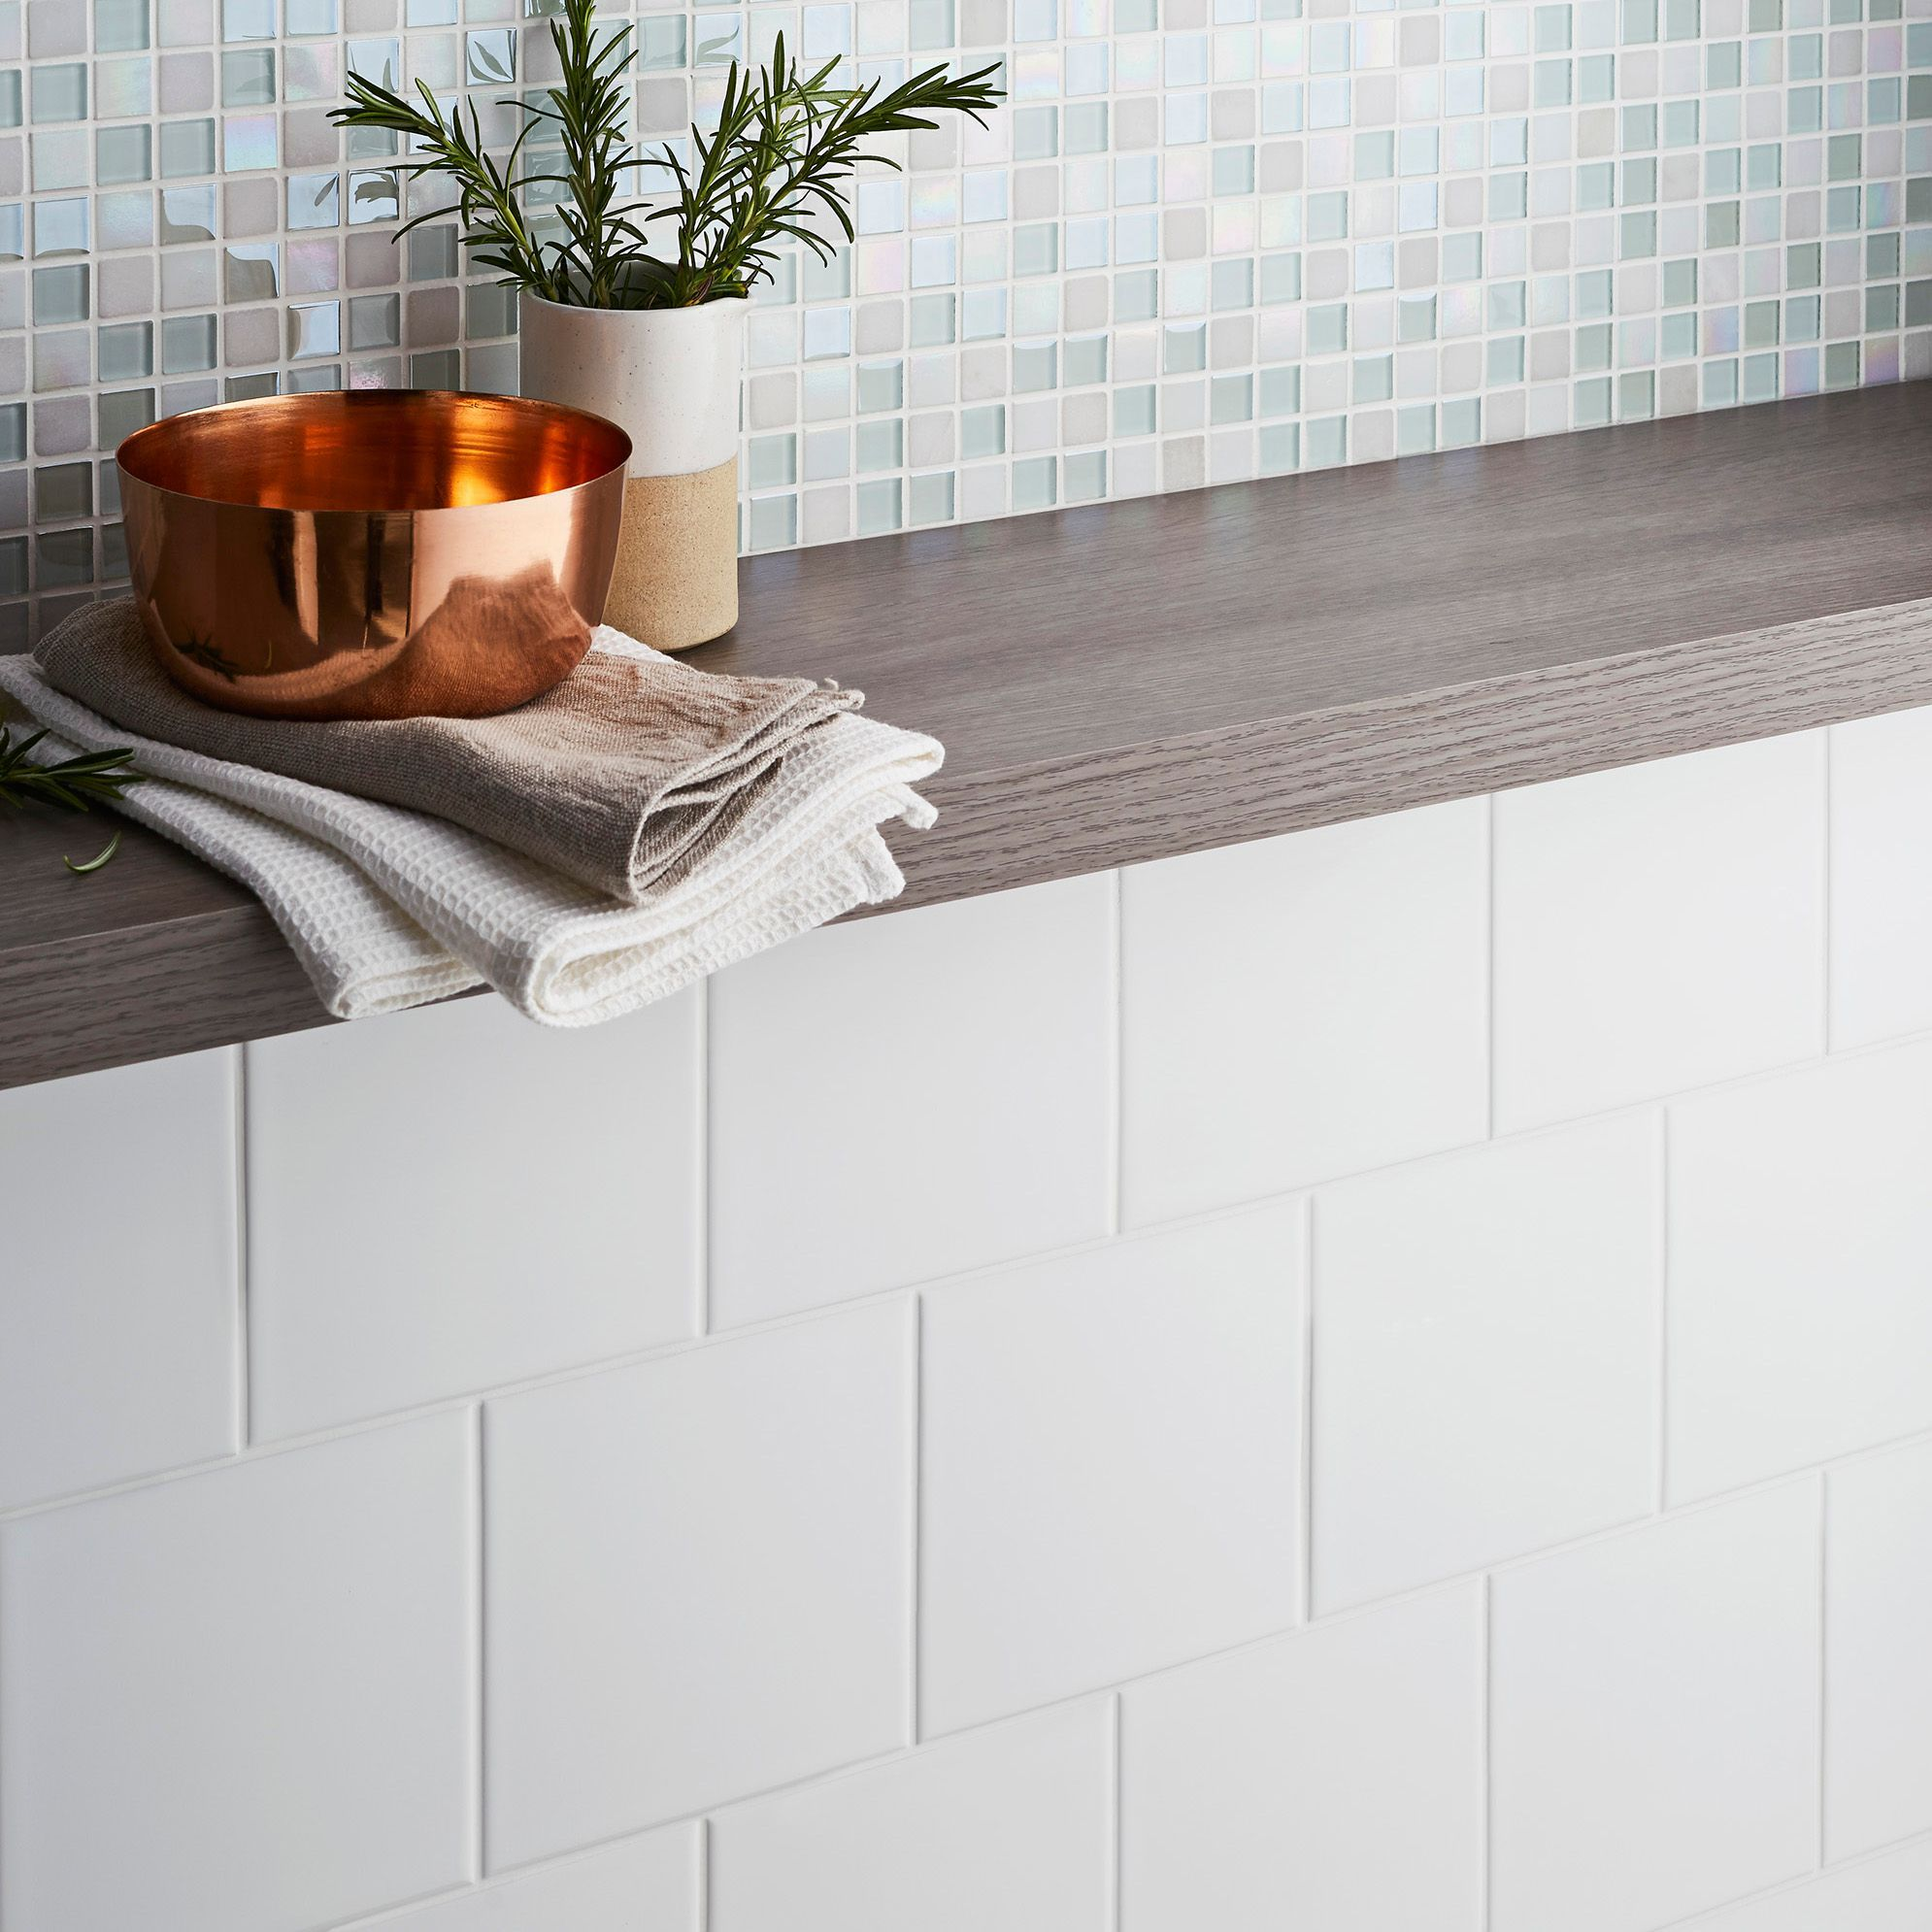 leccia white gloss ceramic wall tile pack of 44 l 150mm w 150mm sample